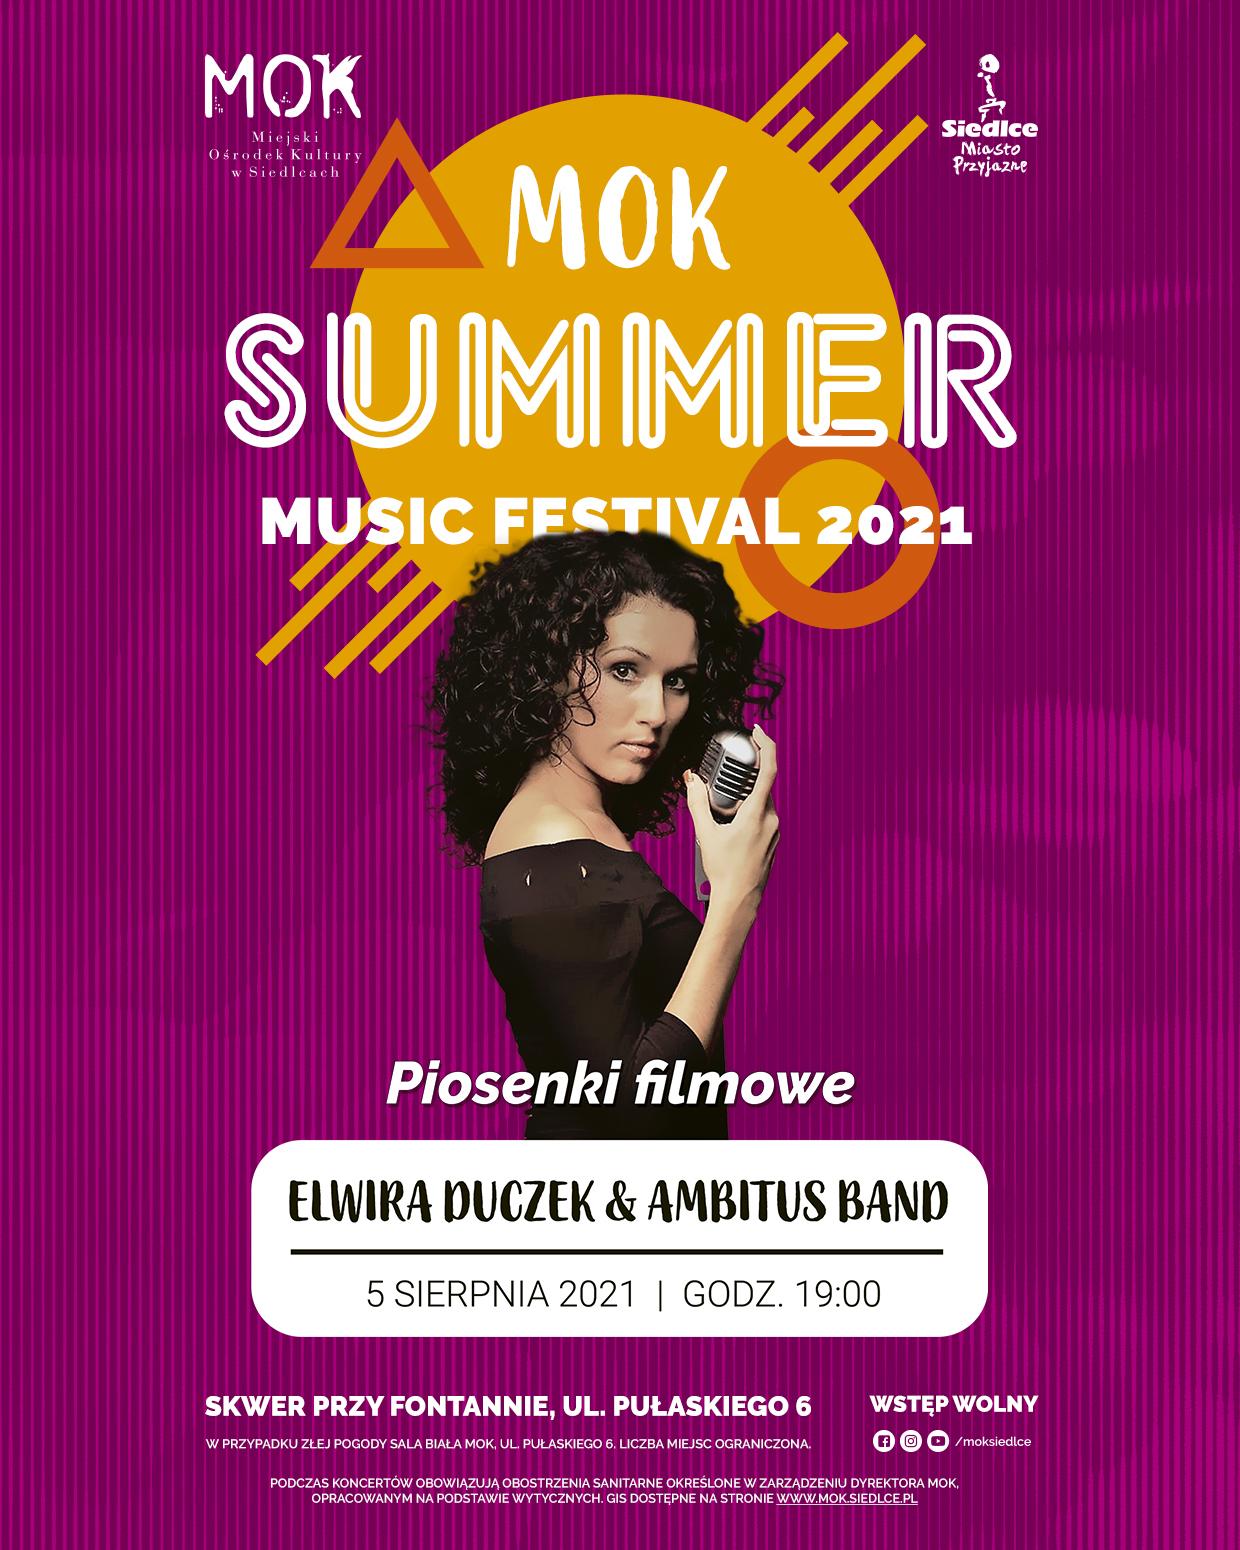 Summer Music Festival 2021 – Elwira Duczek & Ambitus Band - Zdjęcie główne